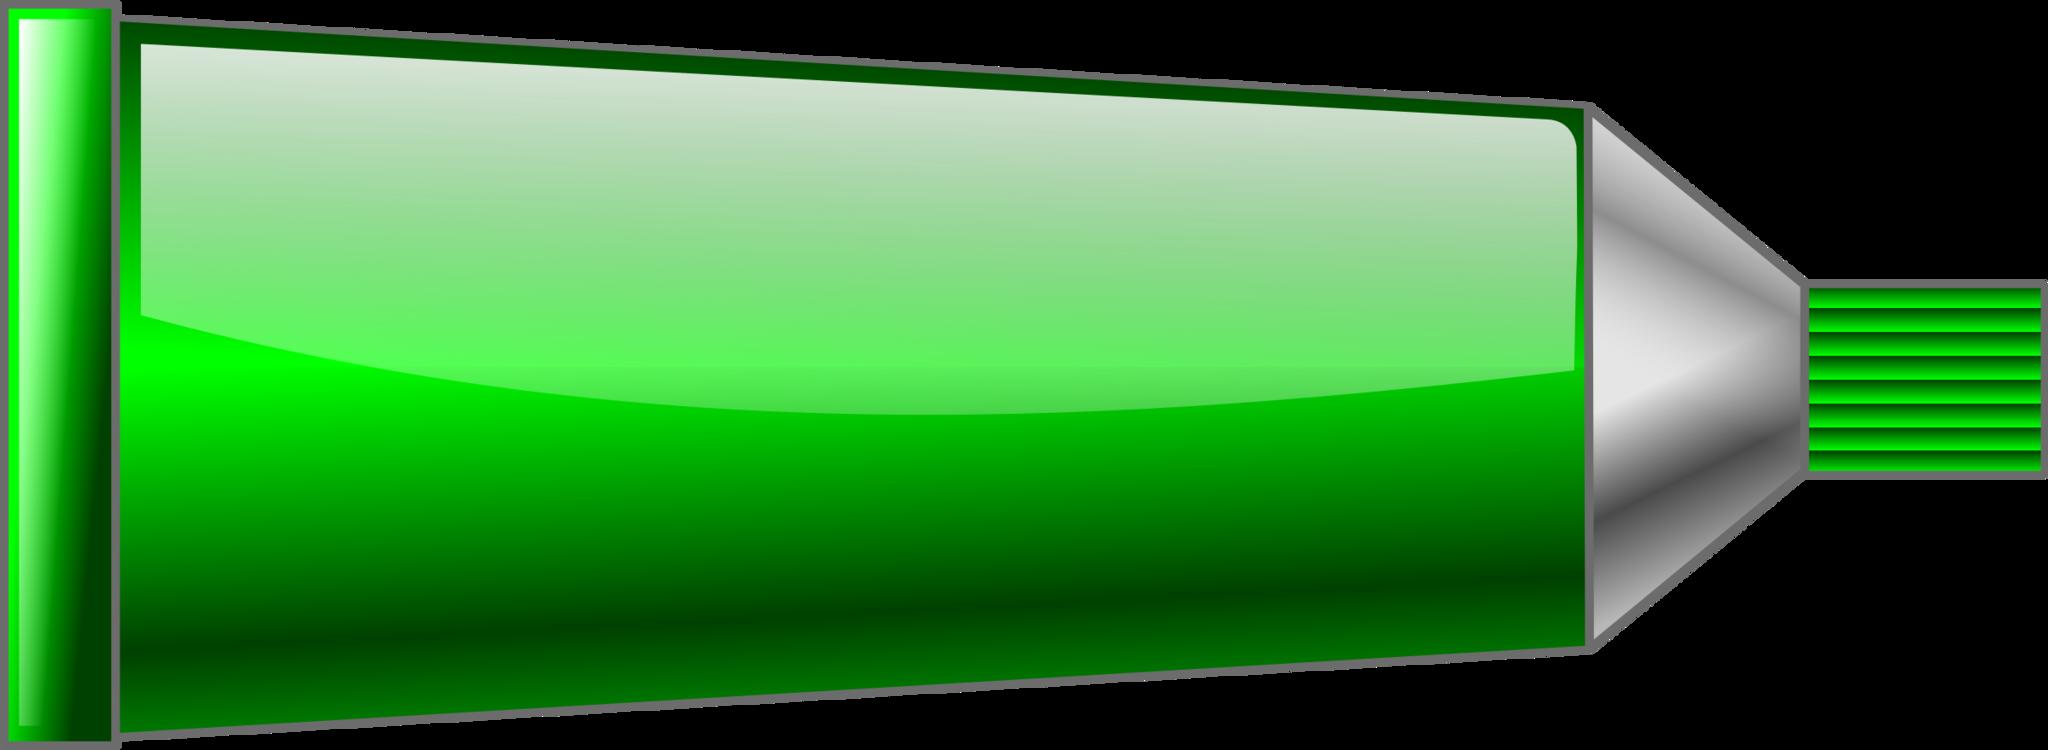 Grass,Angle,Green